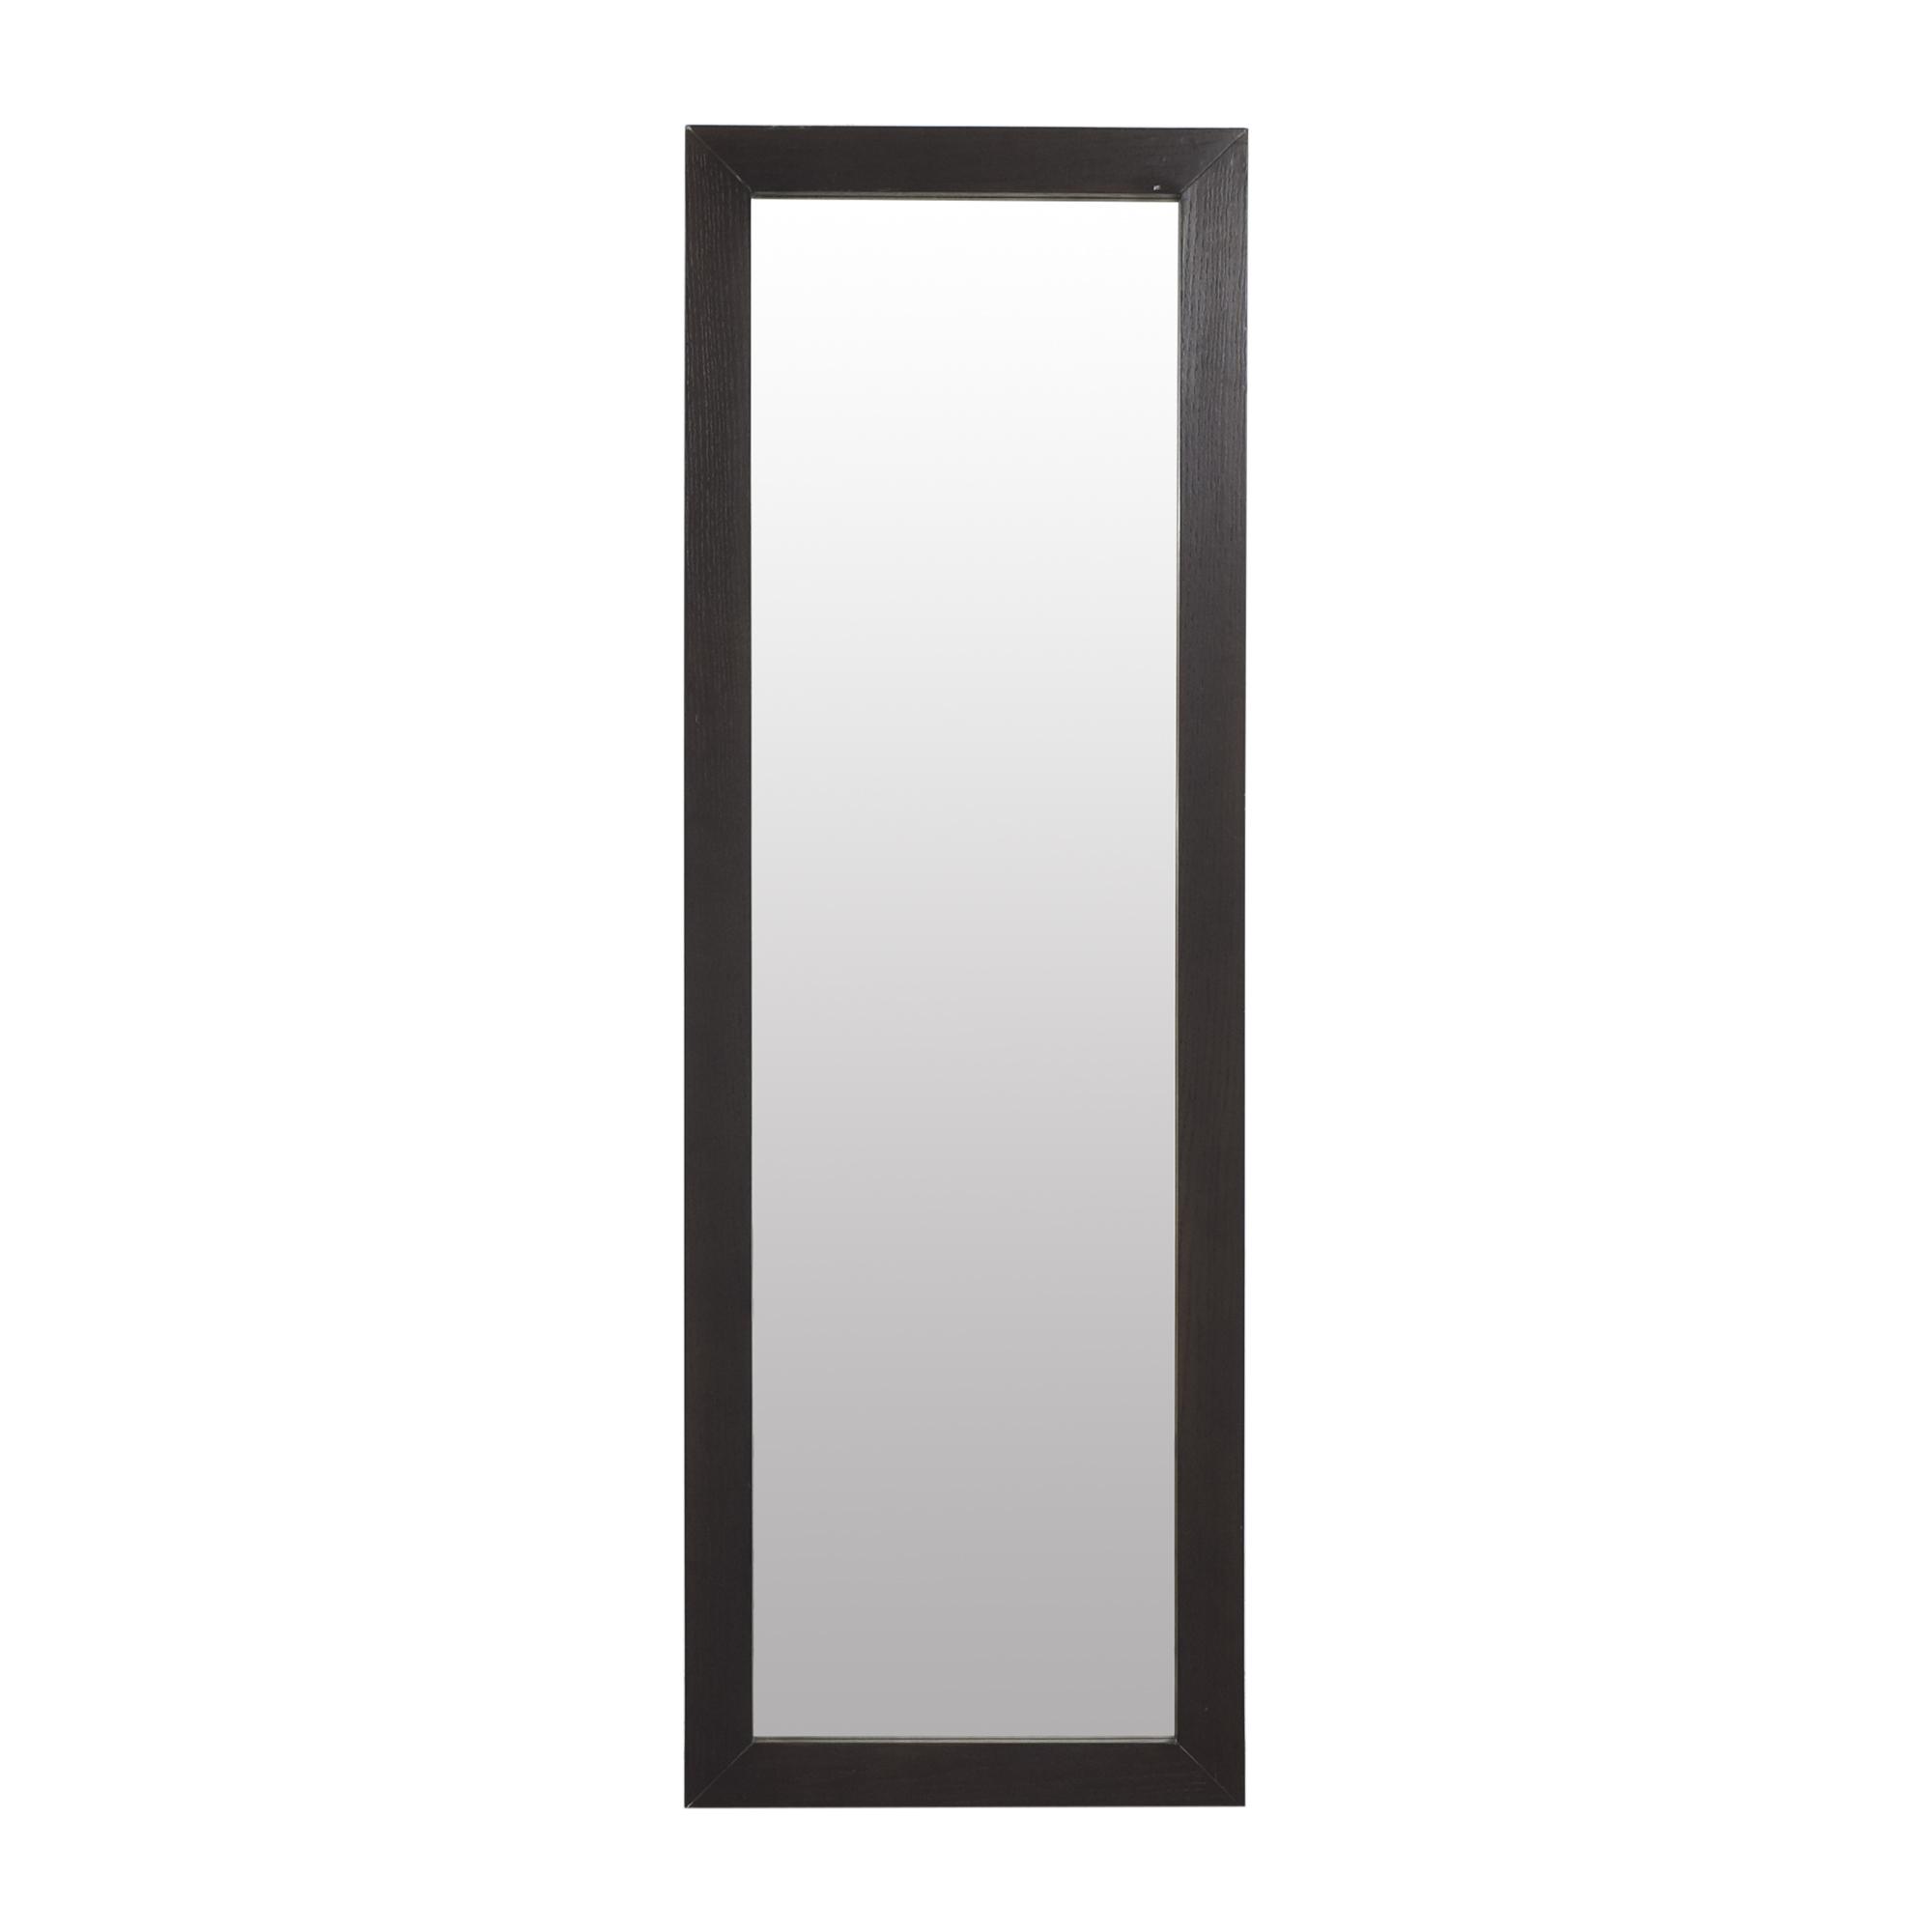 shop West Elm West Elm Parsons Floor Mirror online